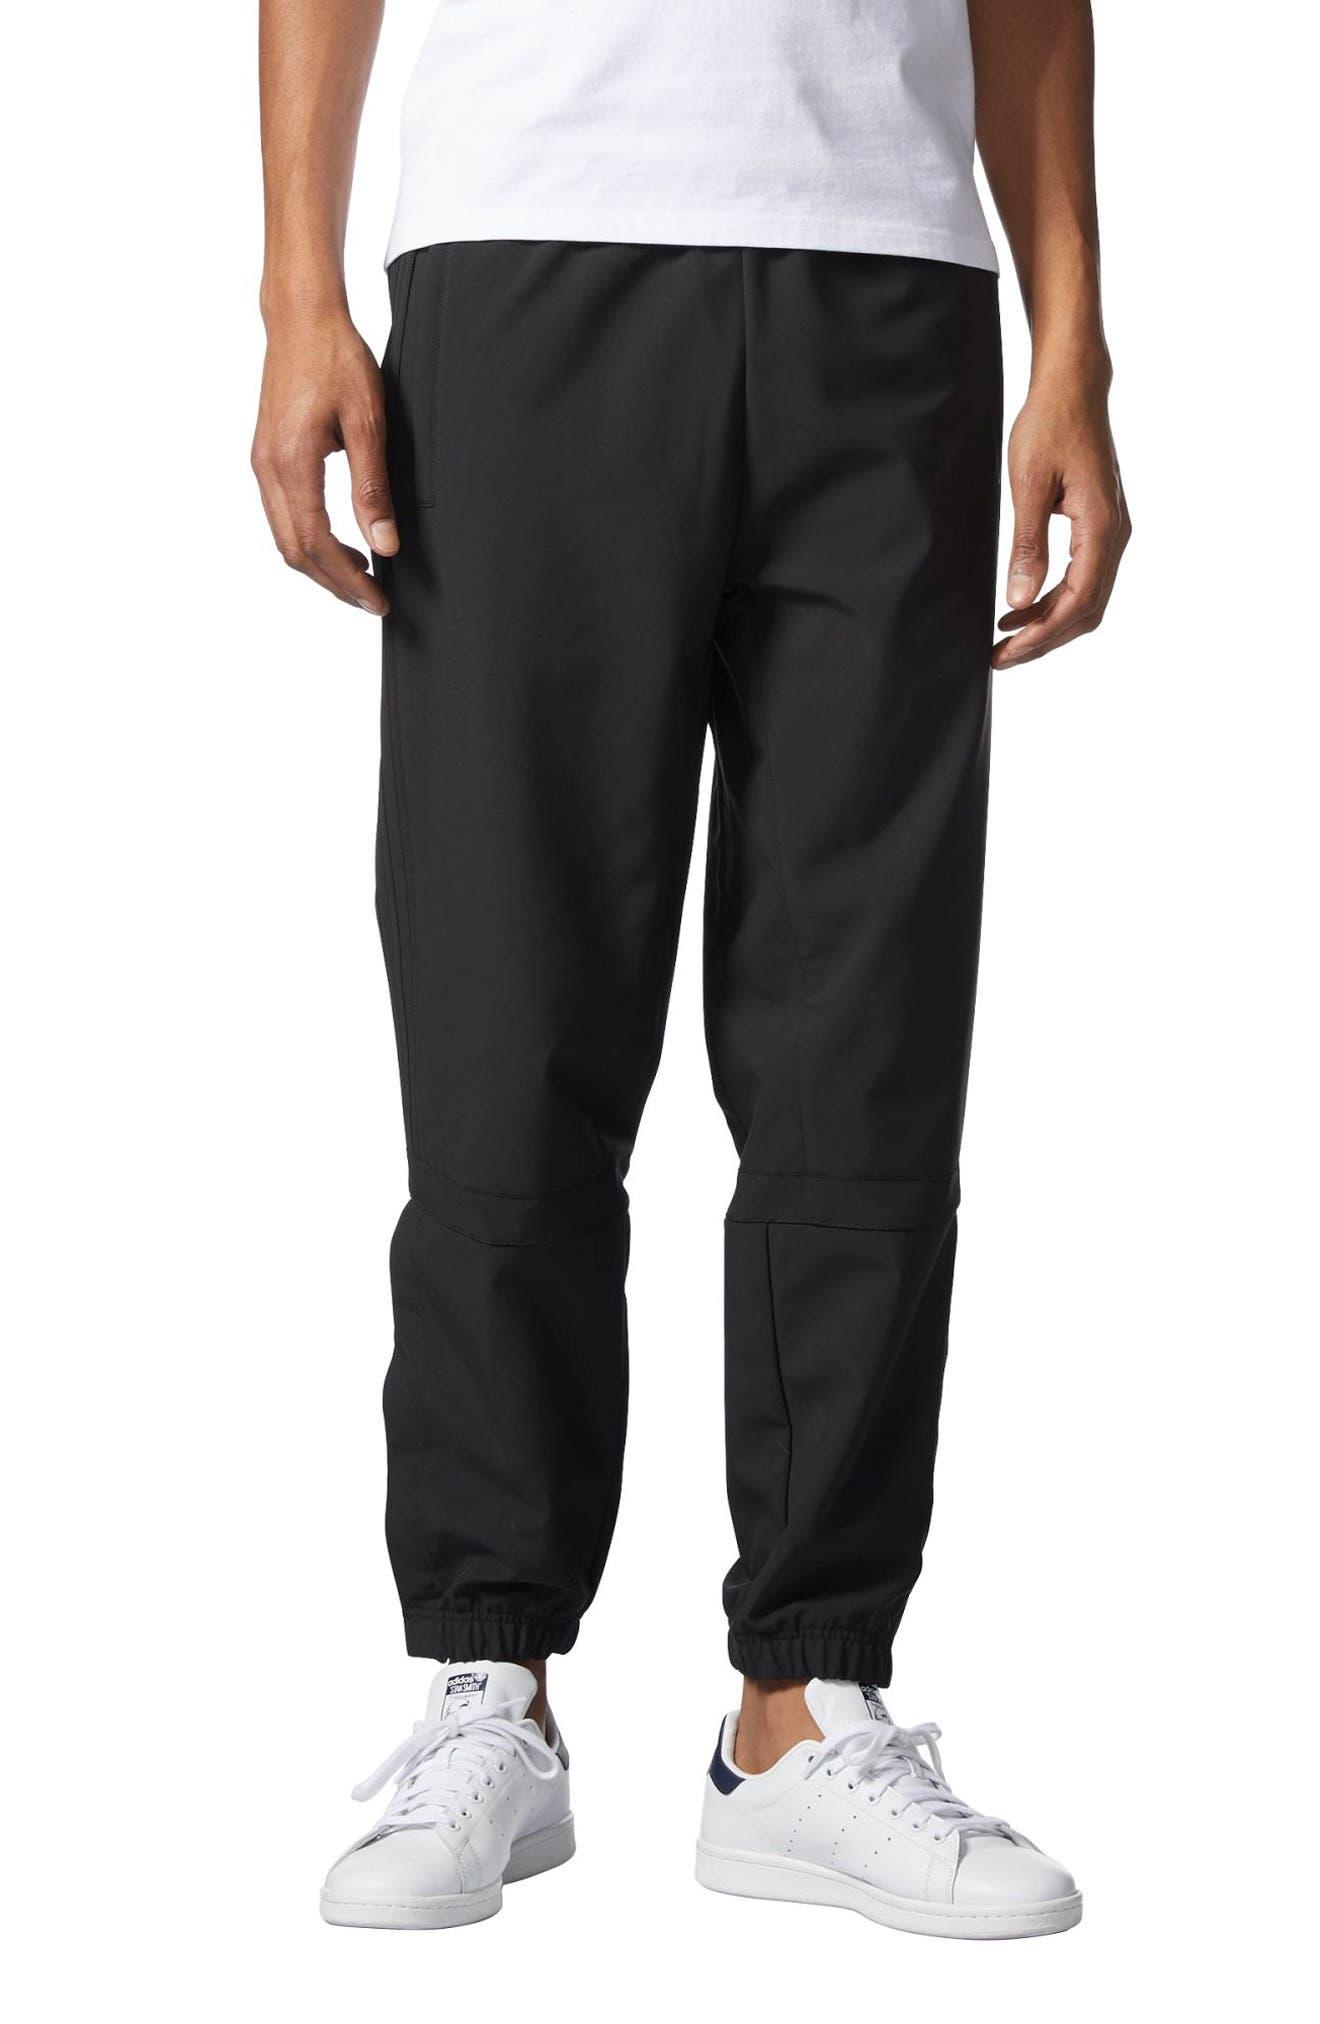 Originals CR8 Hybrid Pants,                             Main thumbnail 1, color,                             001